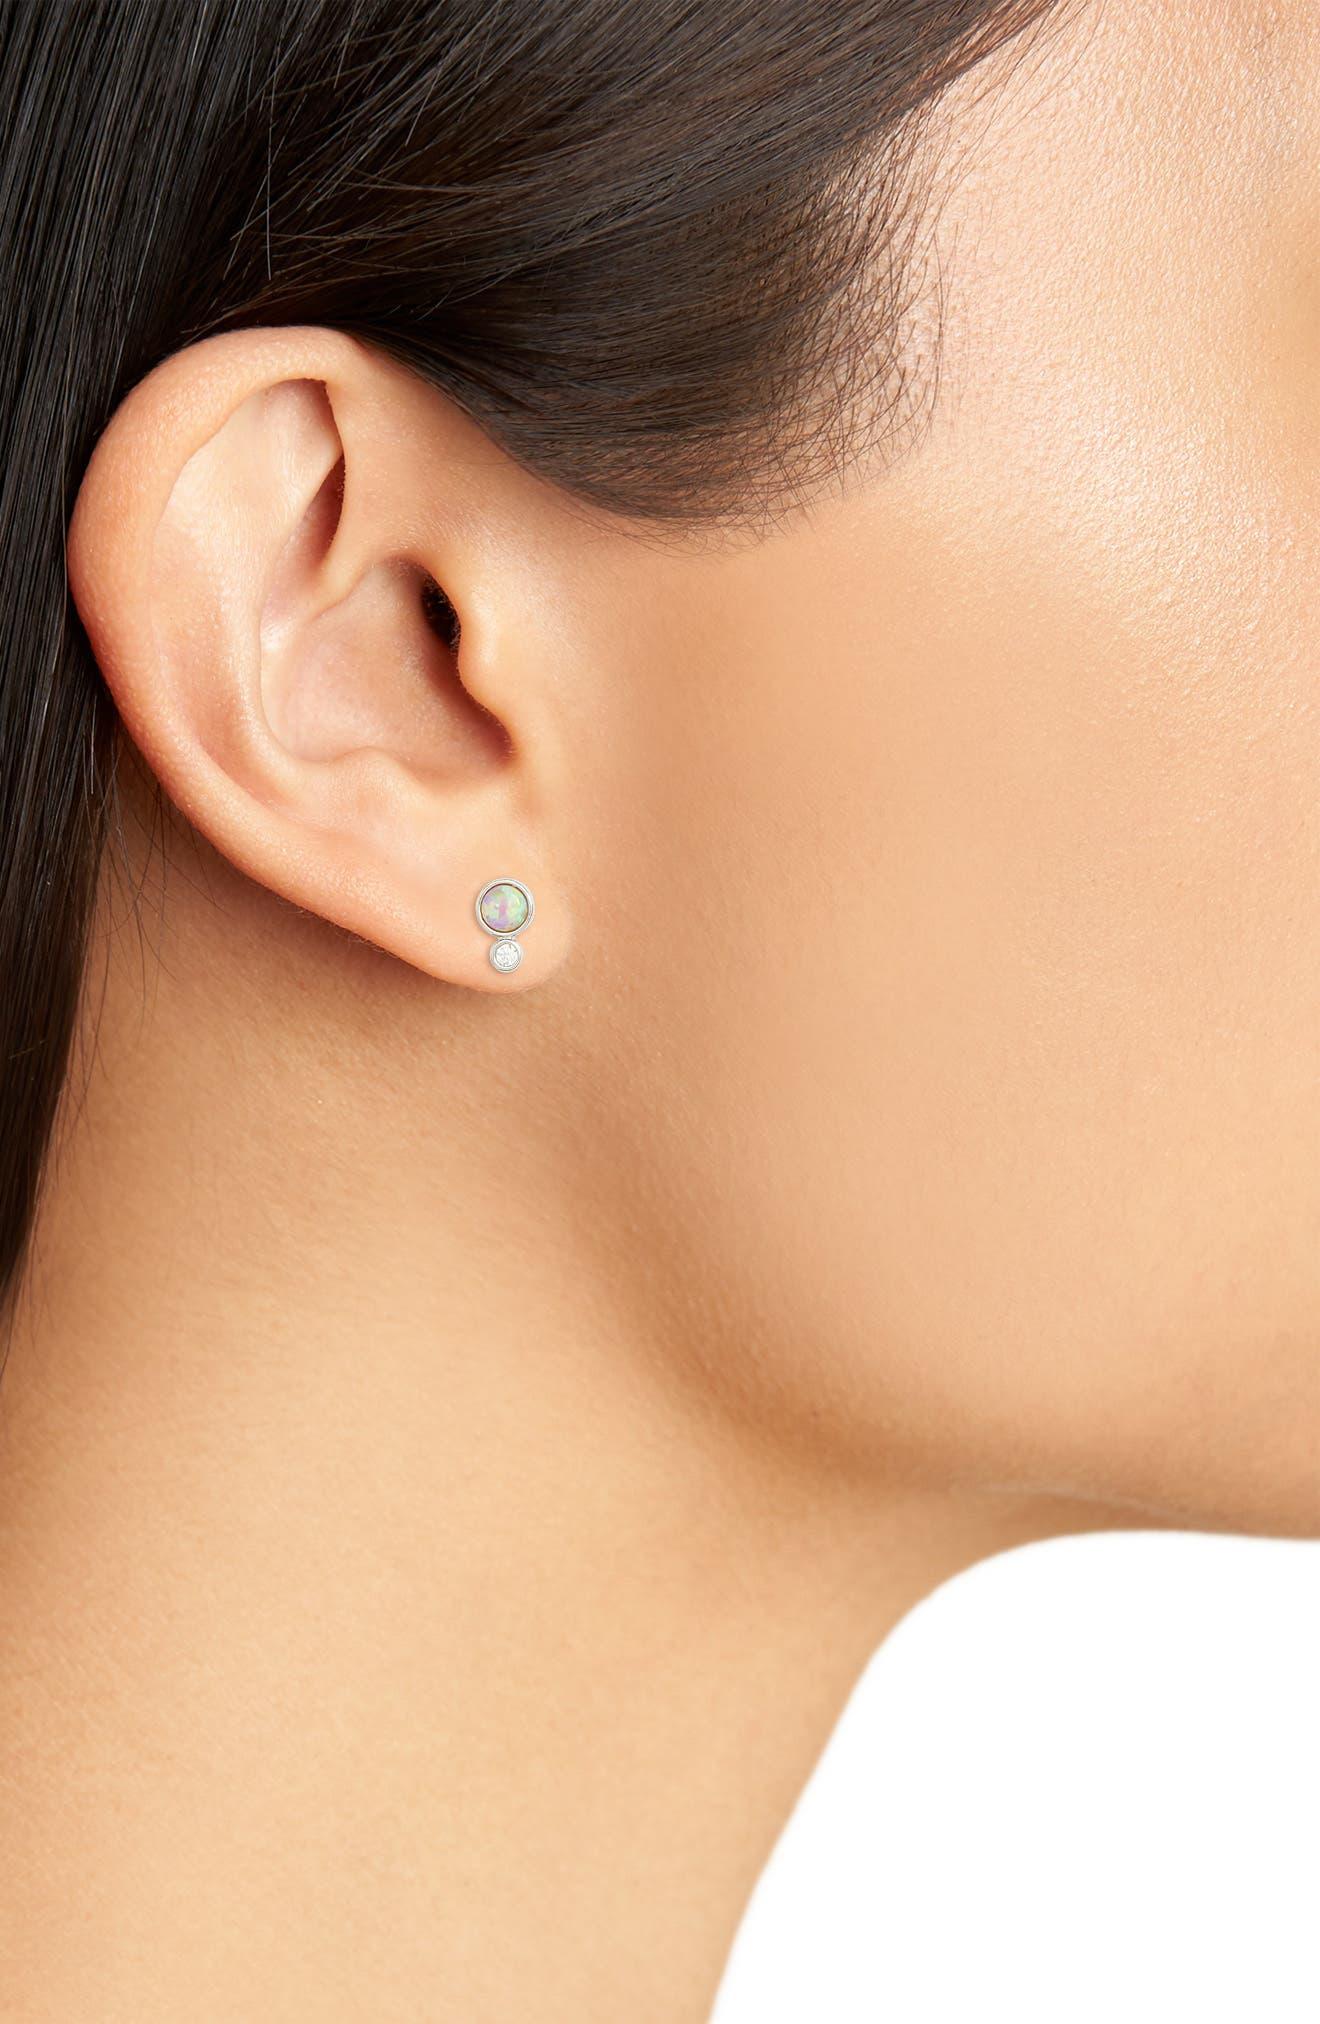 Set of 2 Opal & Cubic Zirconia Stud Earrings,                             Alternate thumbnail 2, color,                             040